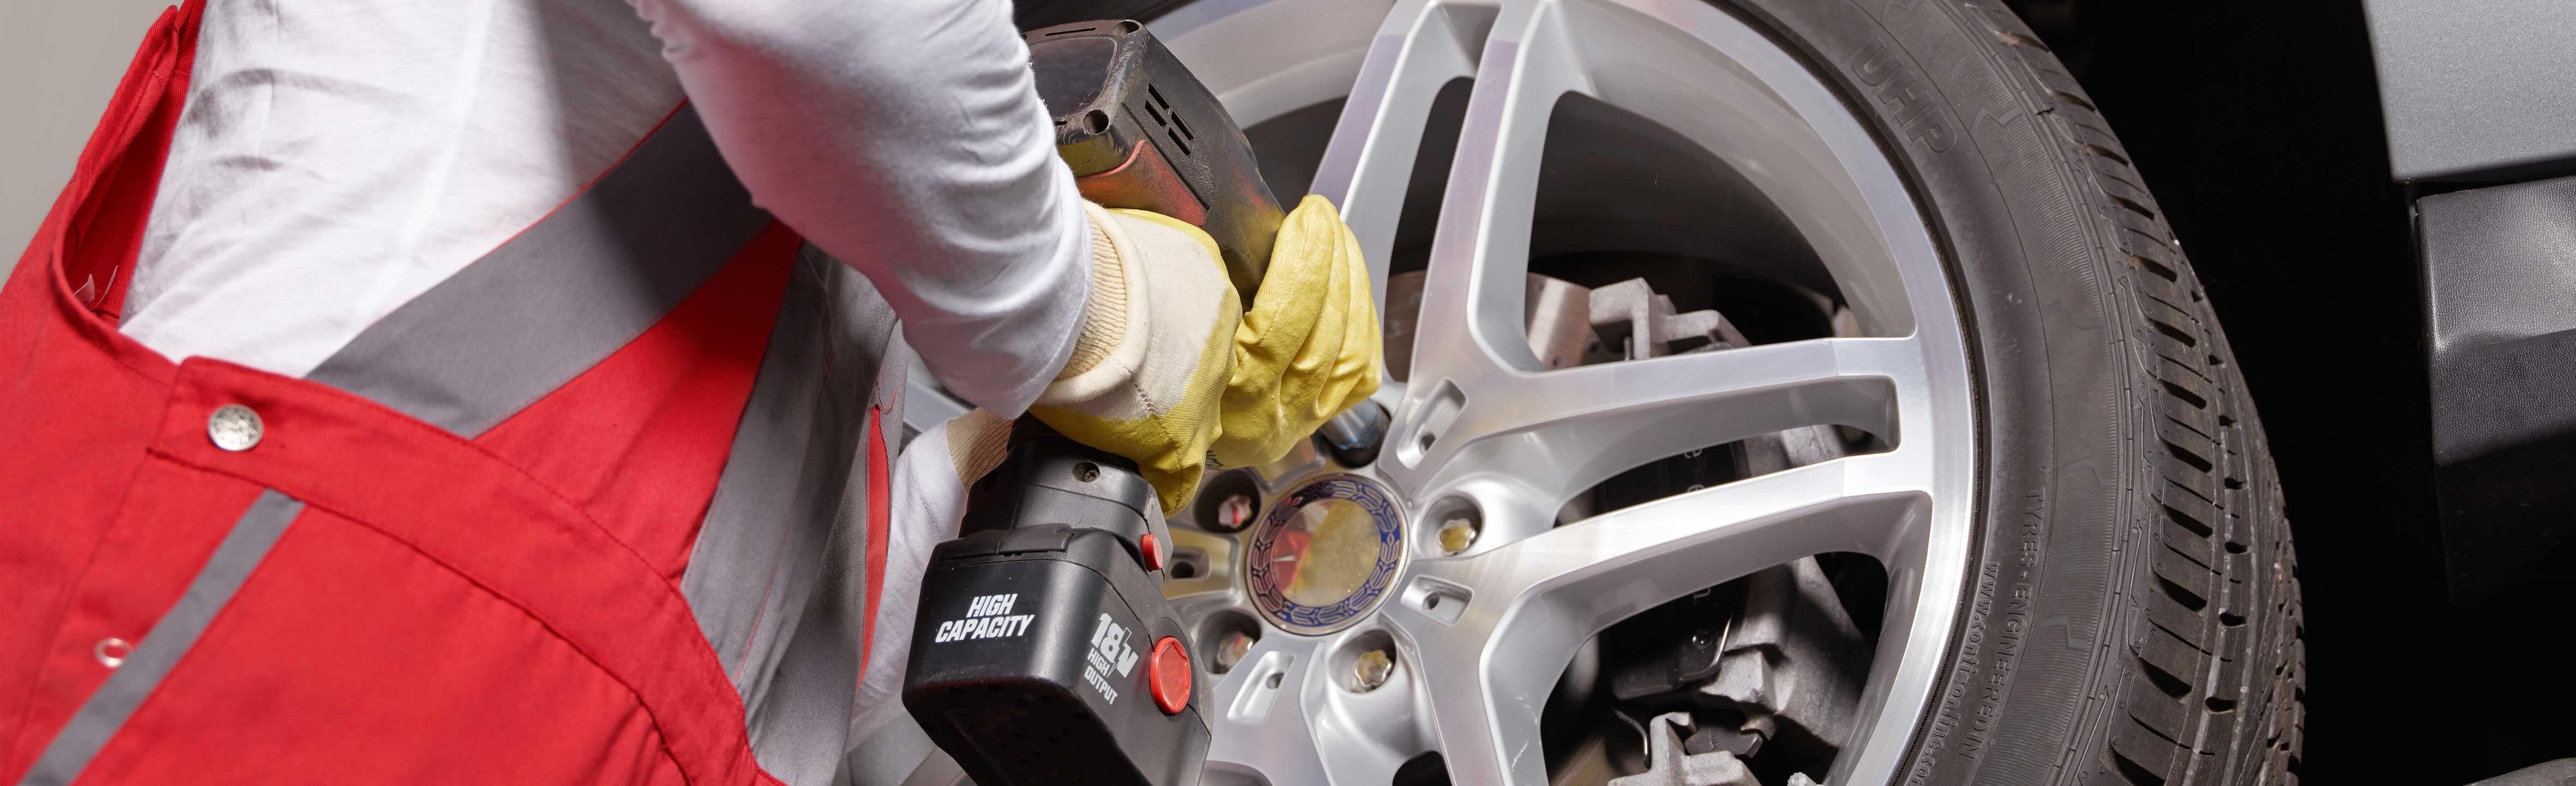 tire services vehicle assistance ken ganley nissan medina ohio